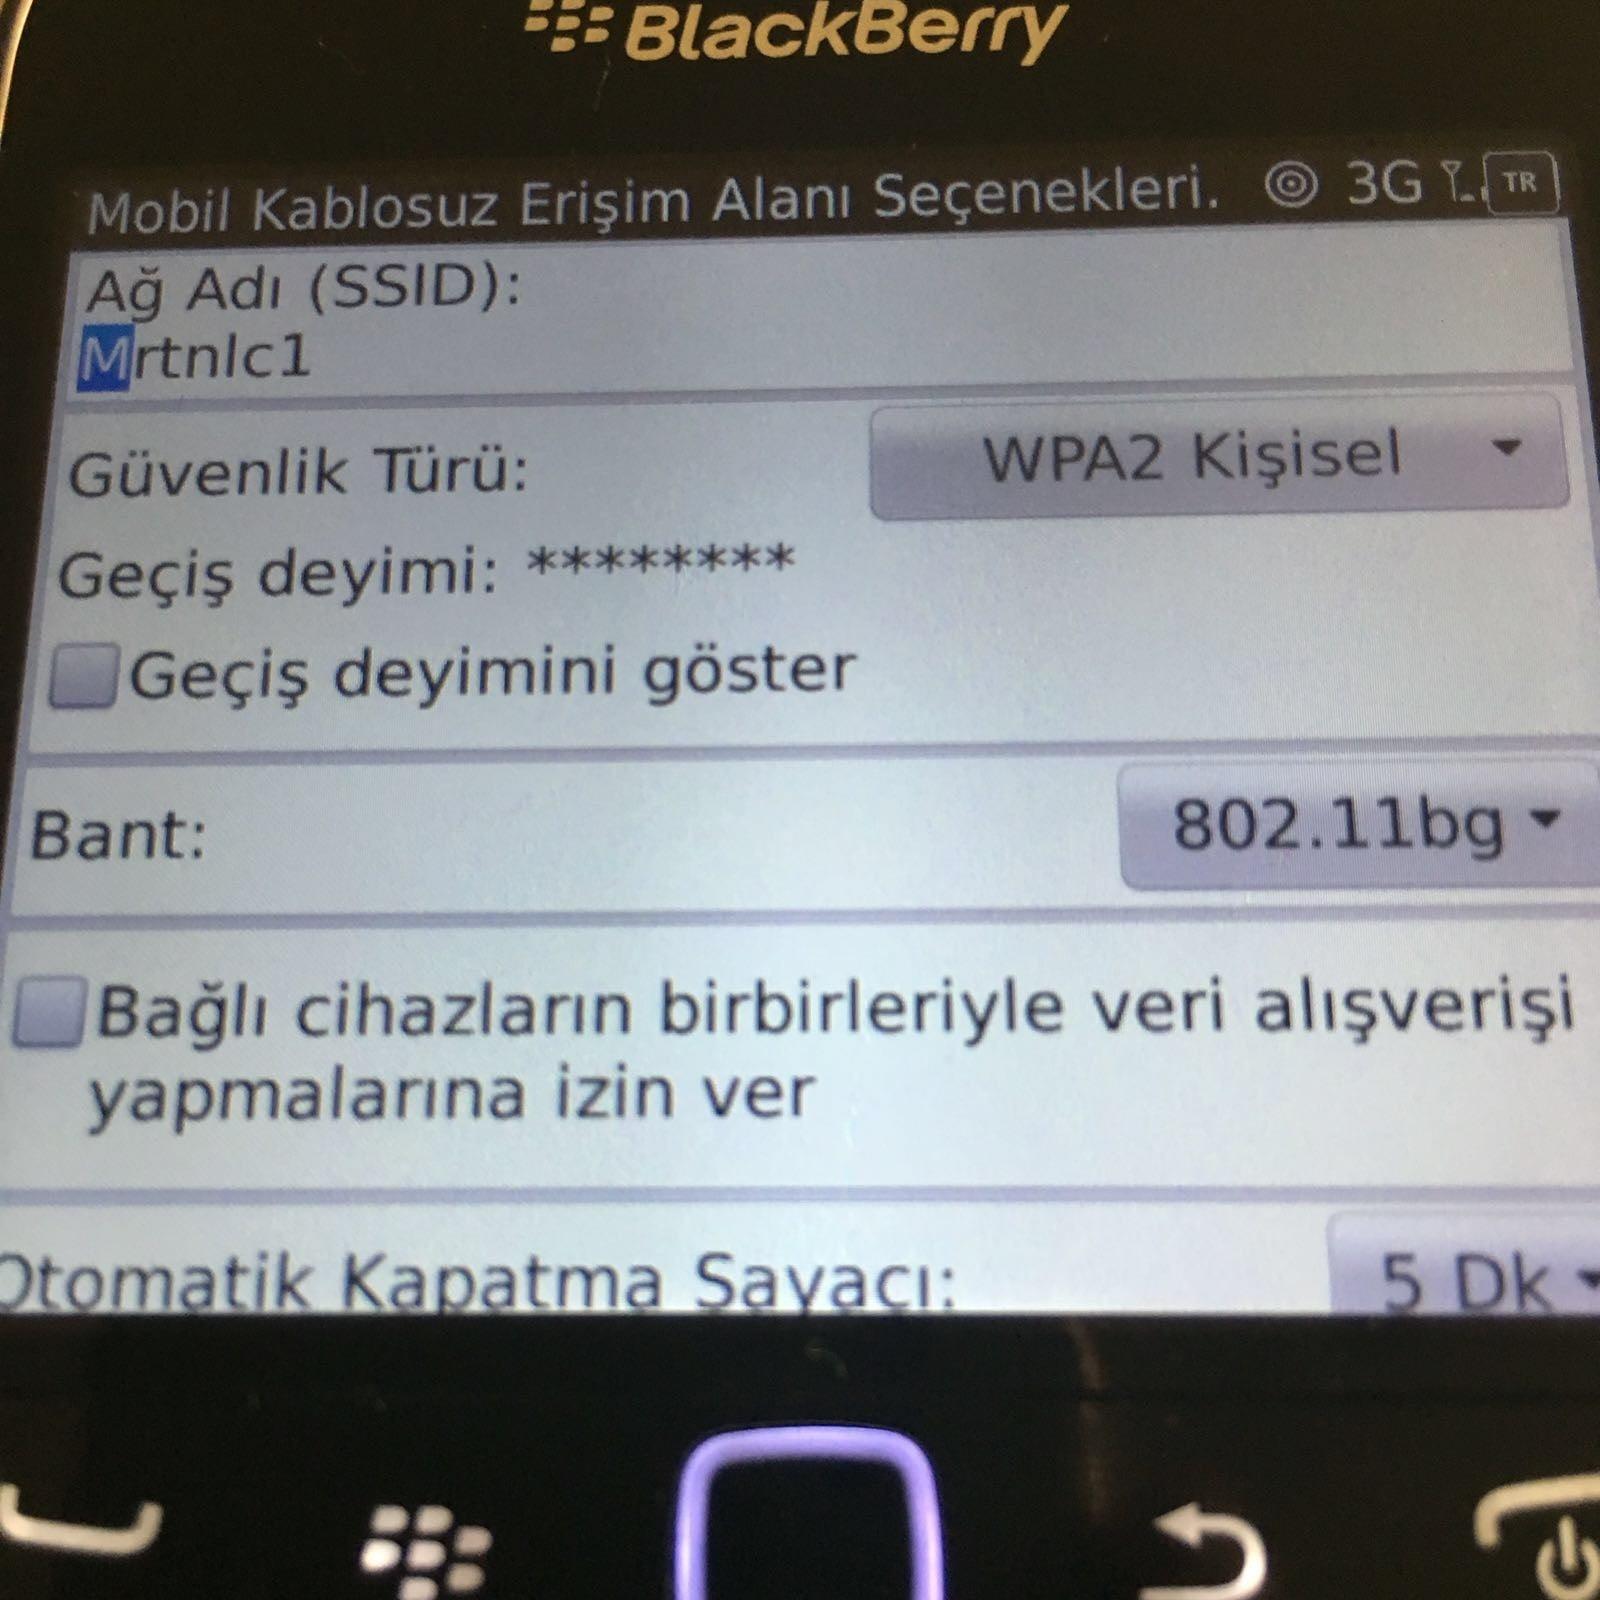 bb9900-5